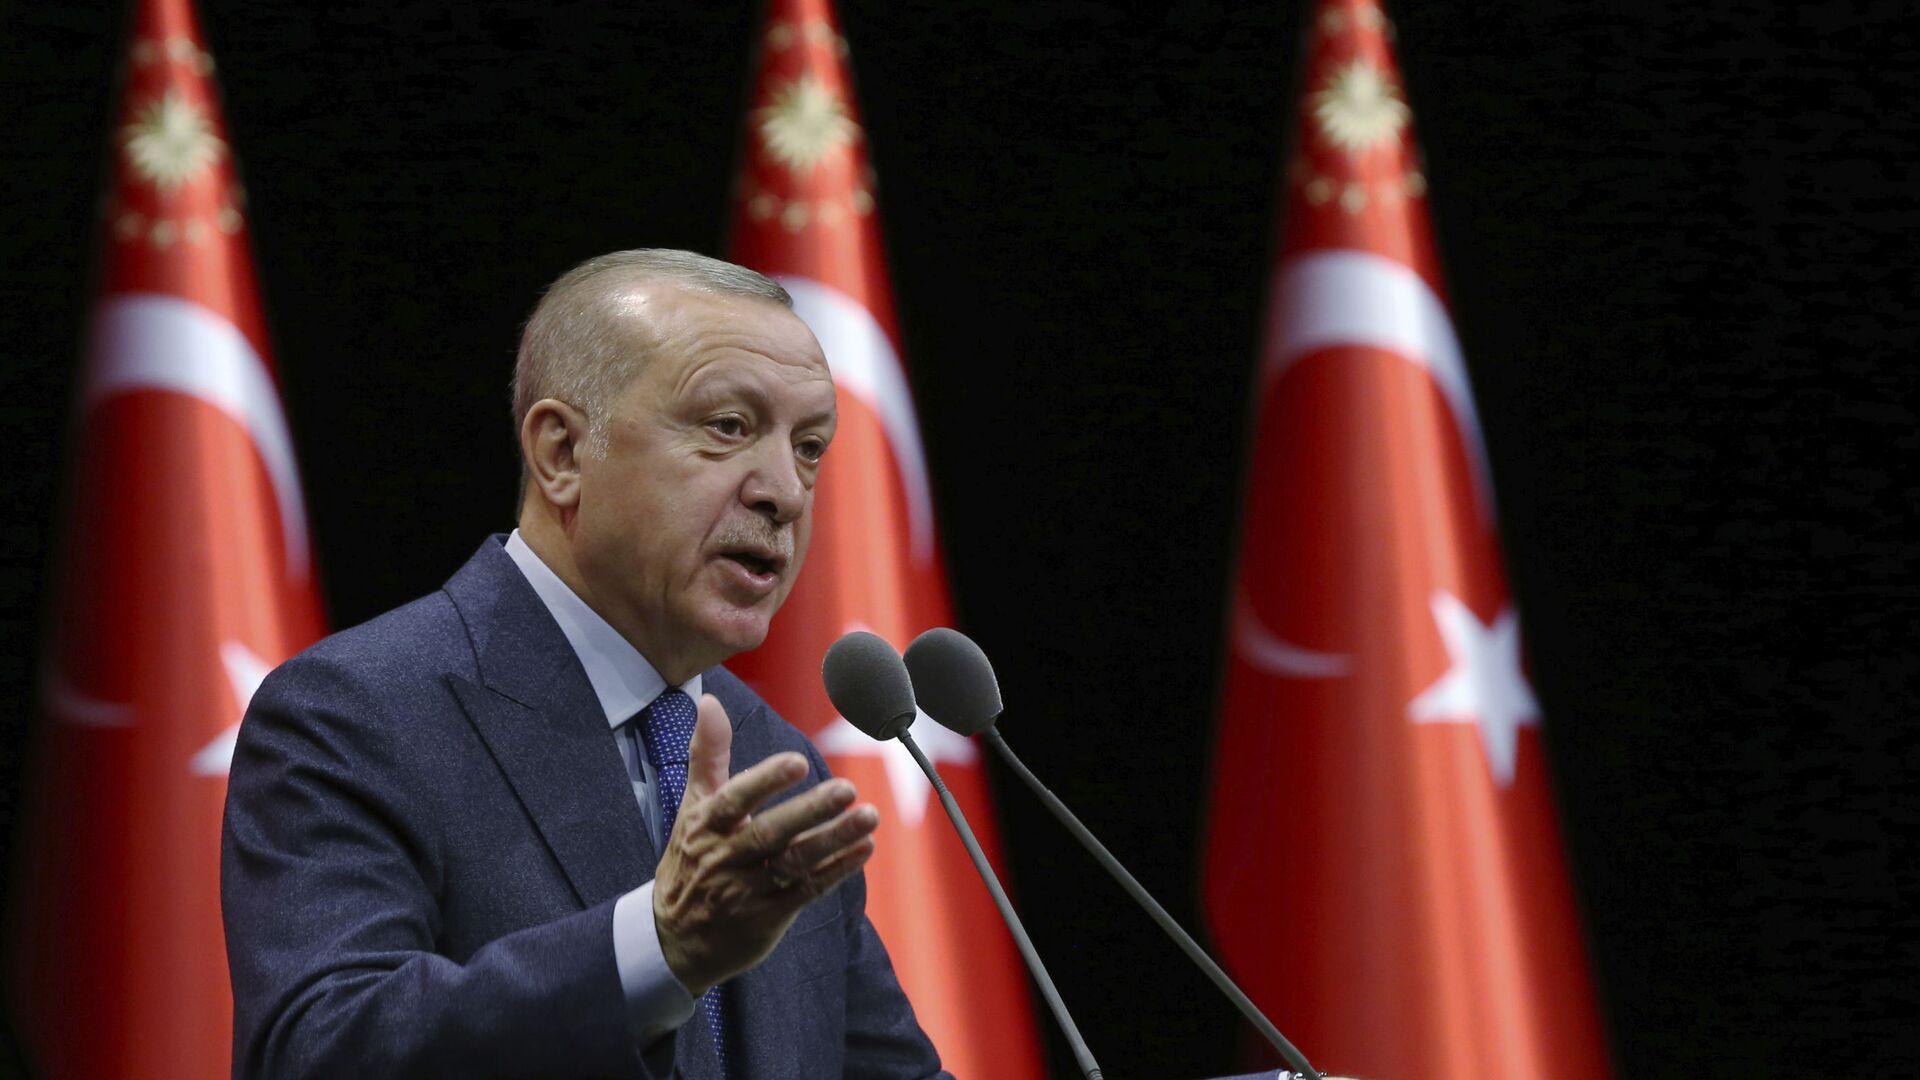 Turecký prezident Recep Tayyip Erdogan - Sputnik Česká republika, 1920, 09.02.2021